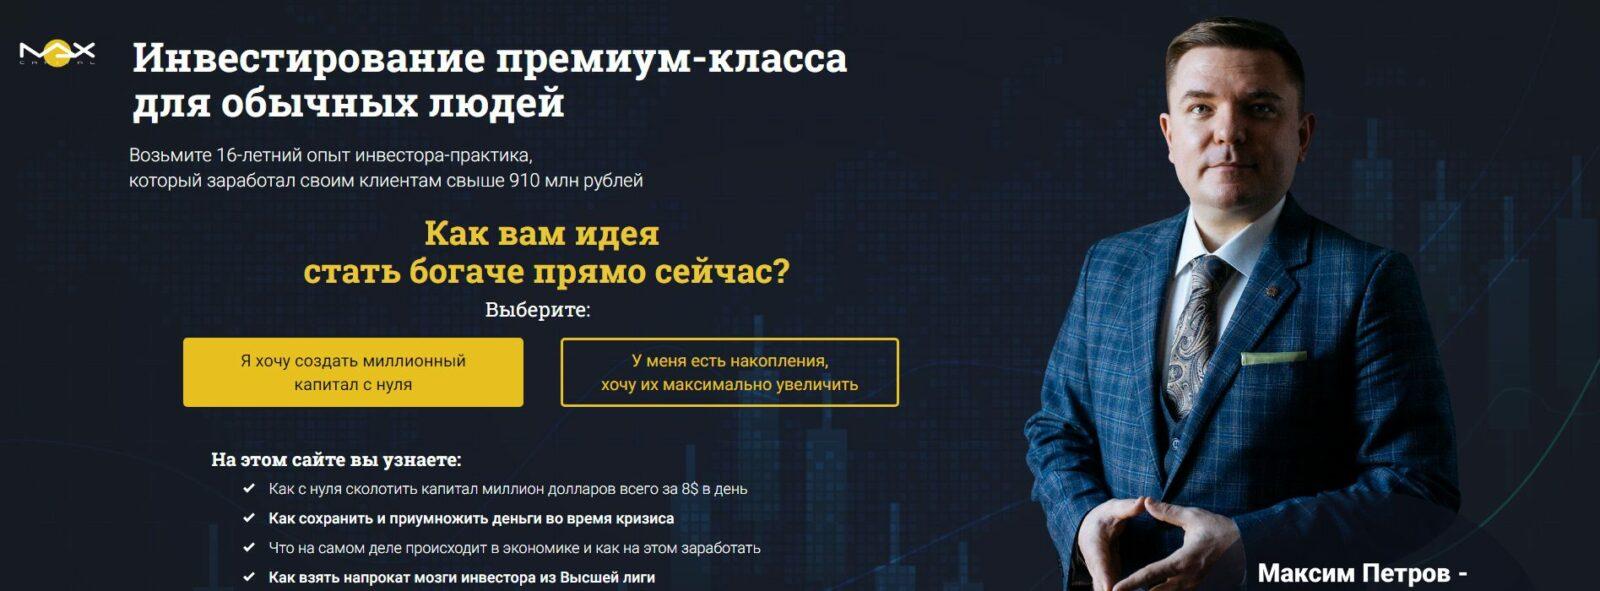 Сайт MaxCapital Максима Петрова